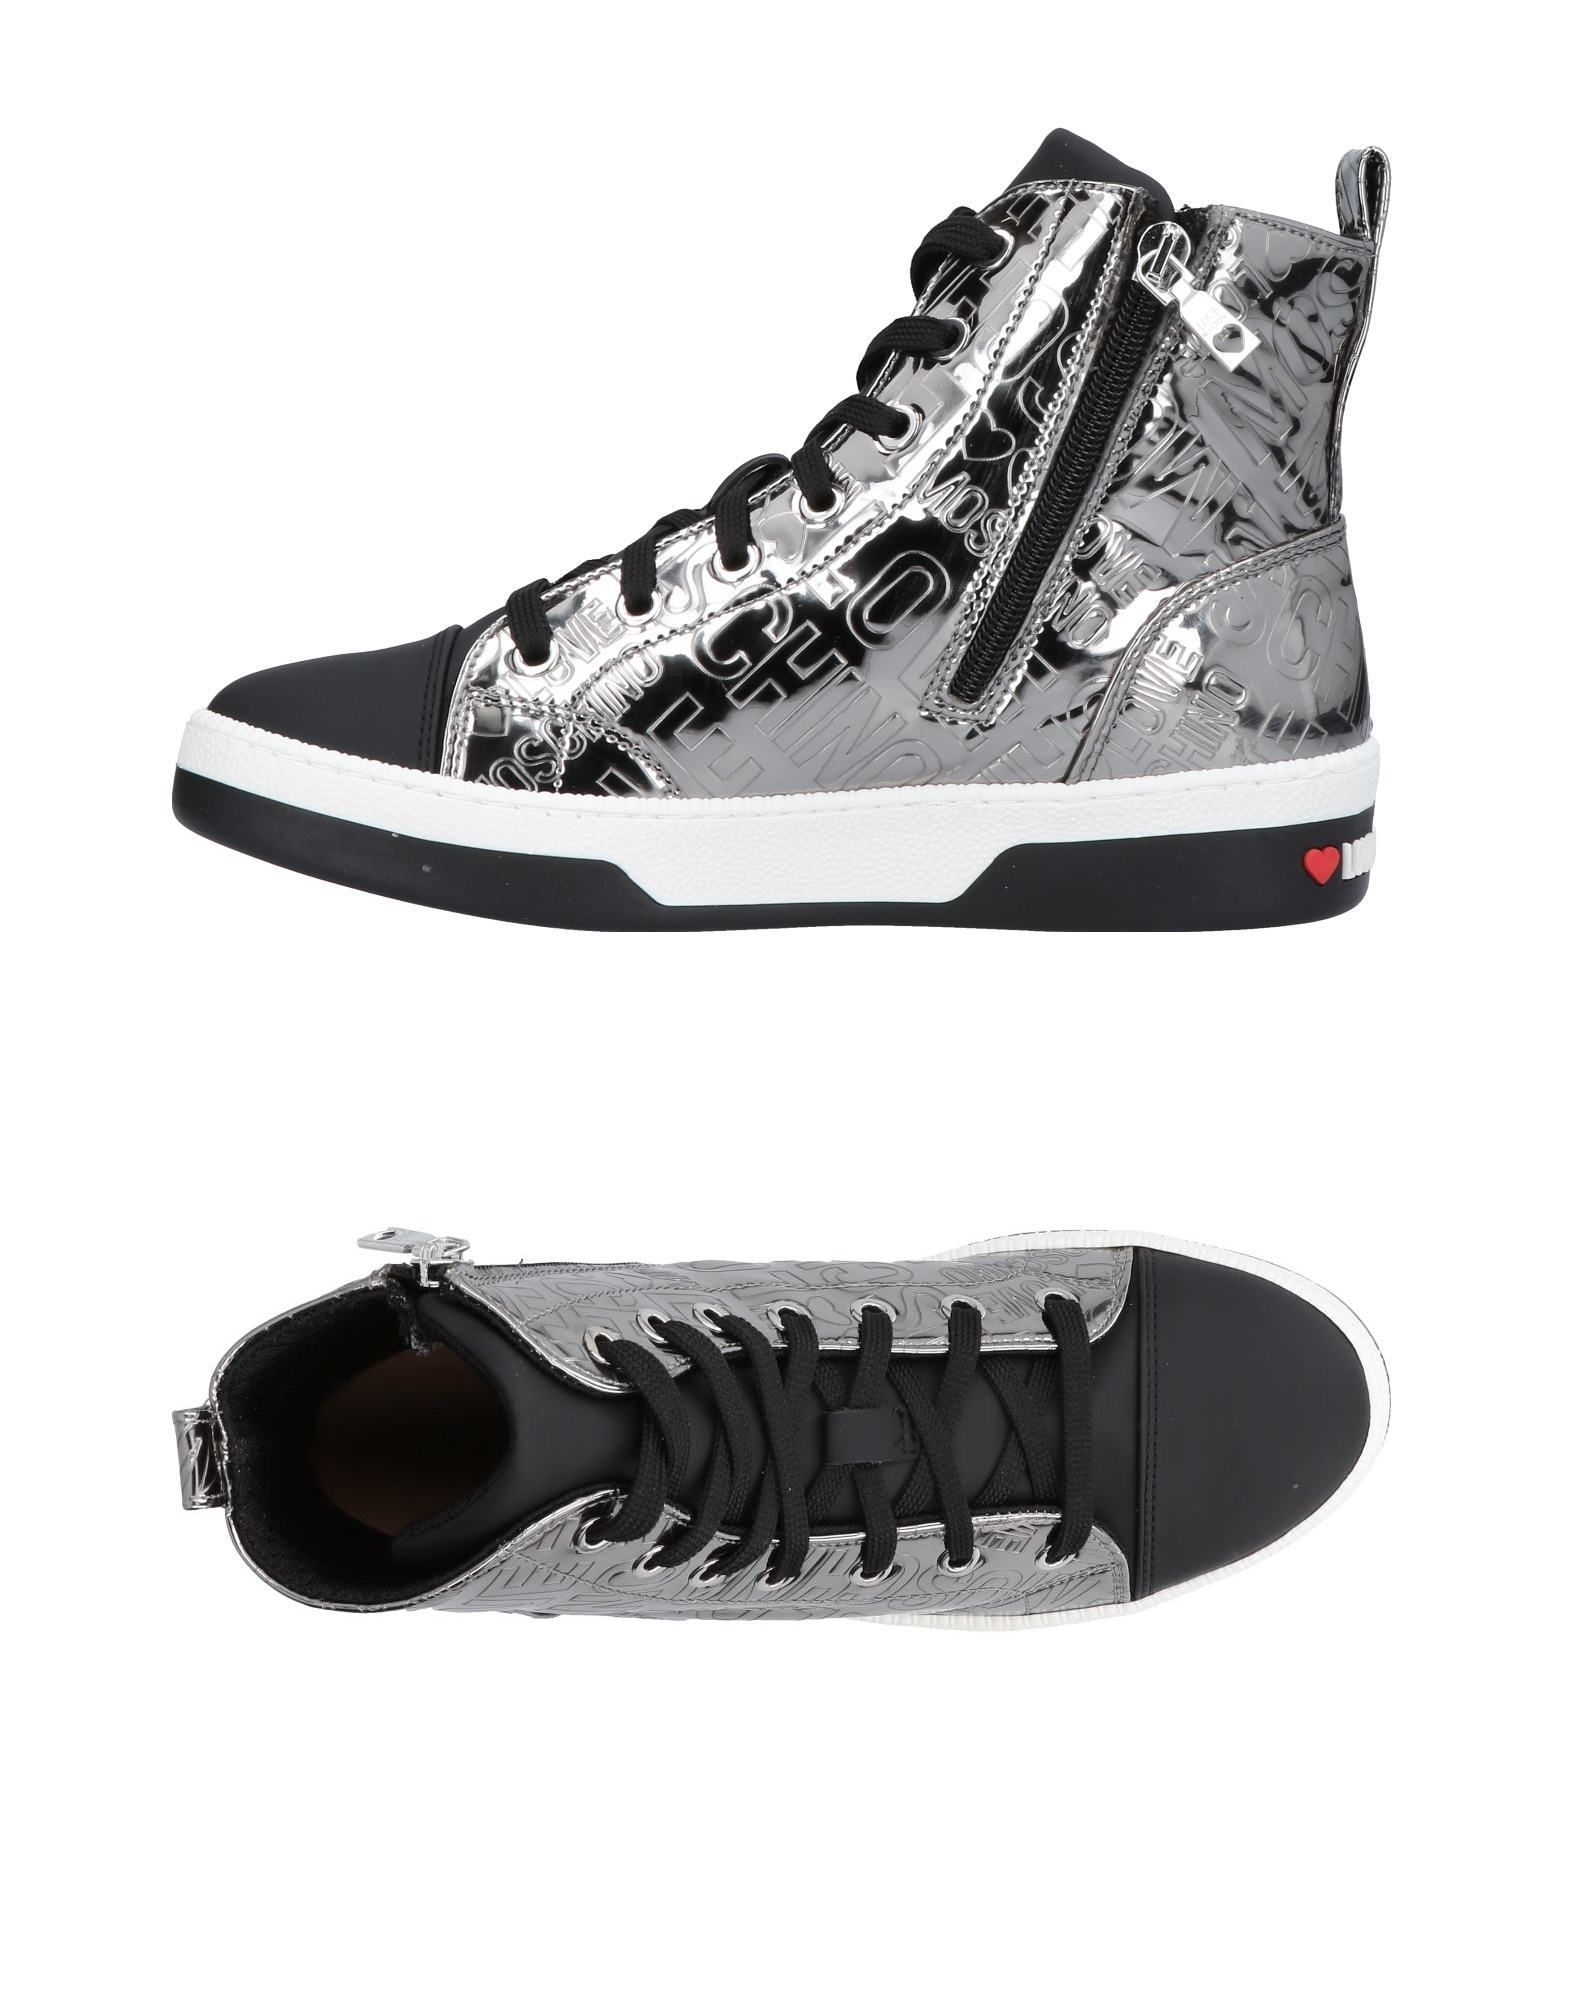 Stilvolle billige Schuhe Love Moschino 11451099HL Sneakers Damen  11451099HL Moschino d6f2cc